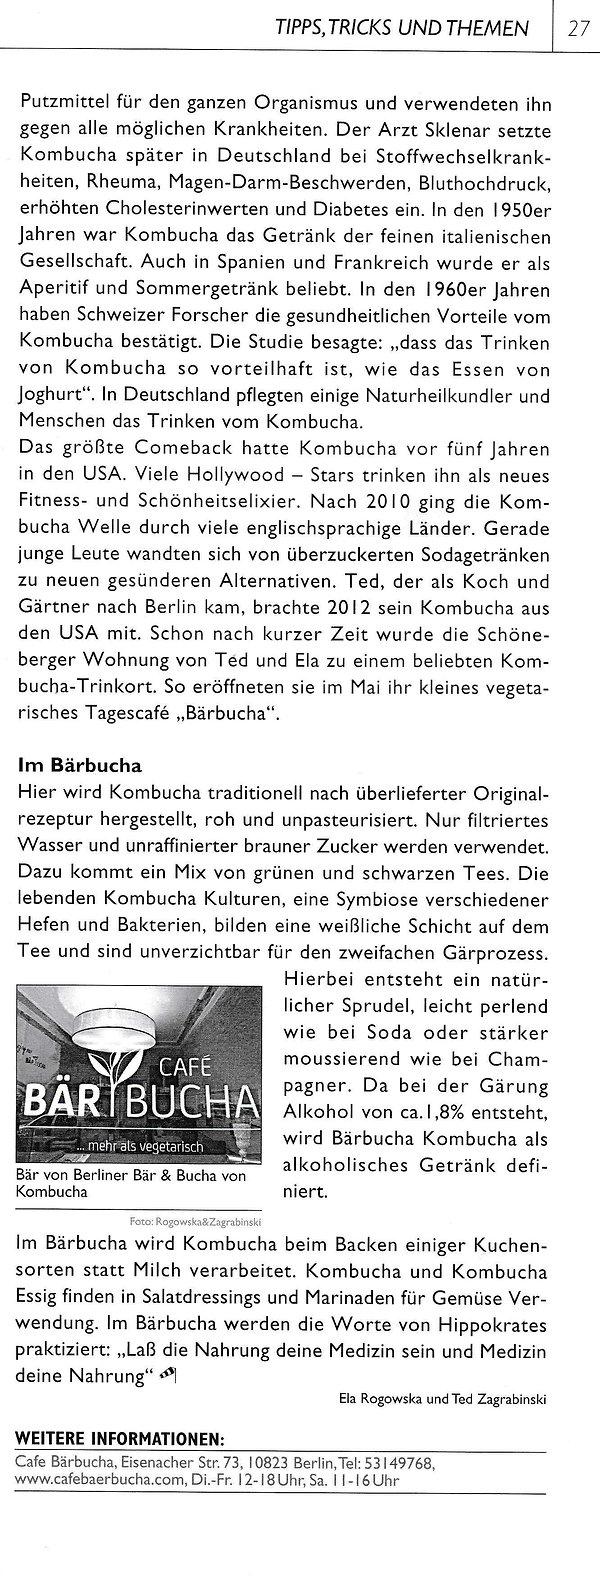 Bärbucha Kombucha in Kiez Schoeneberg